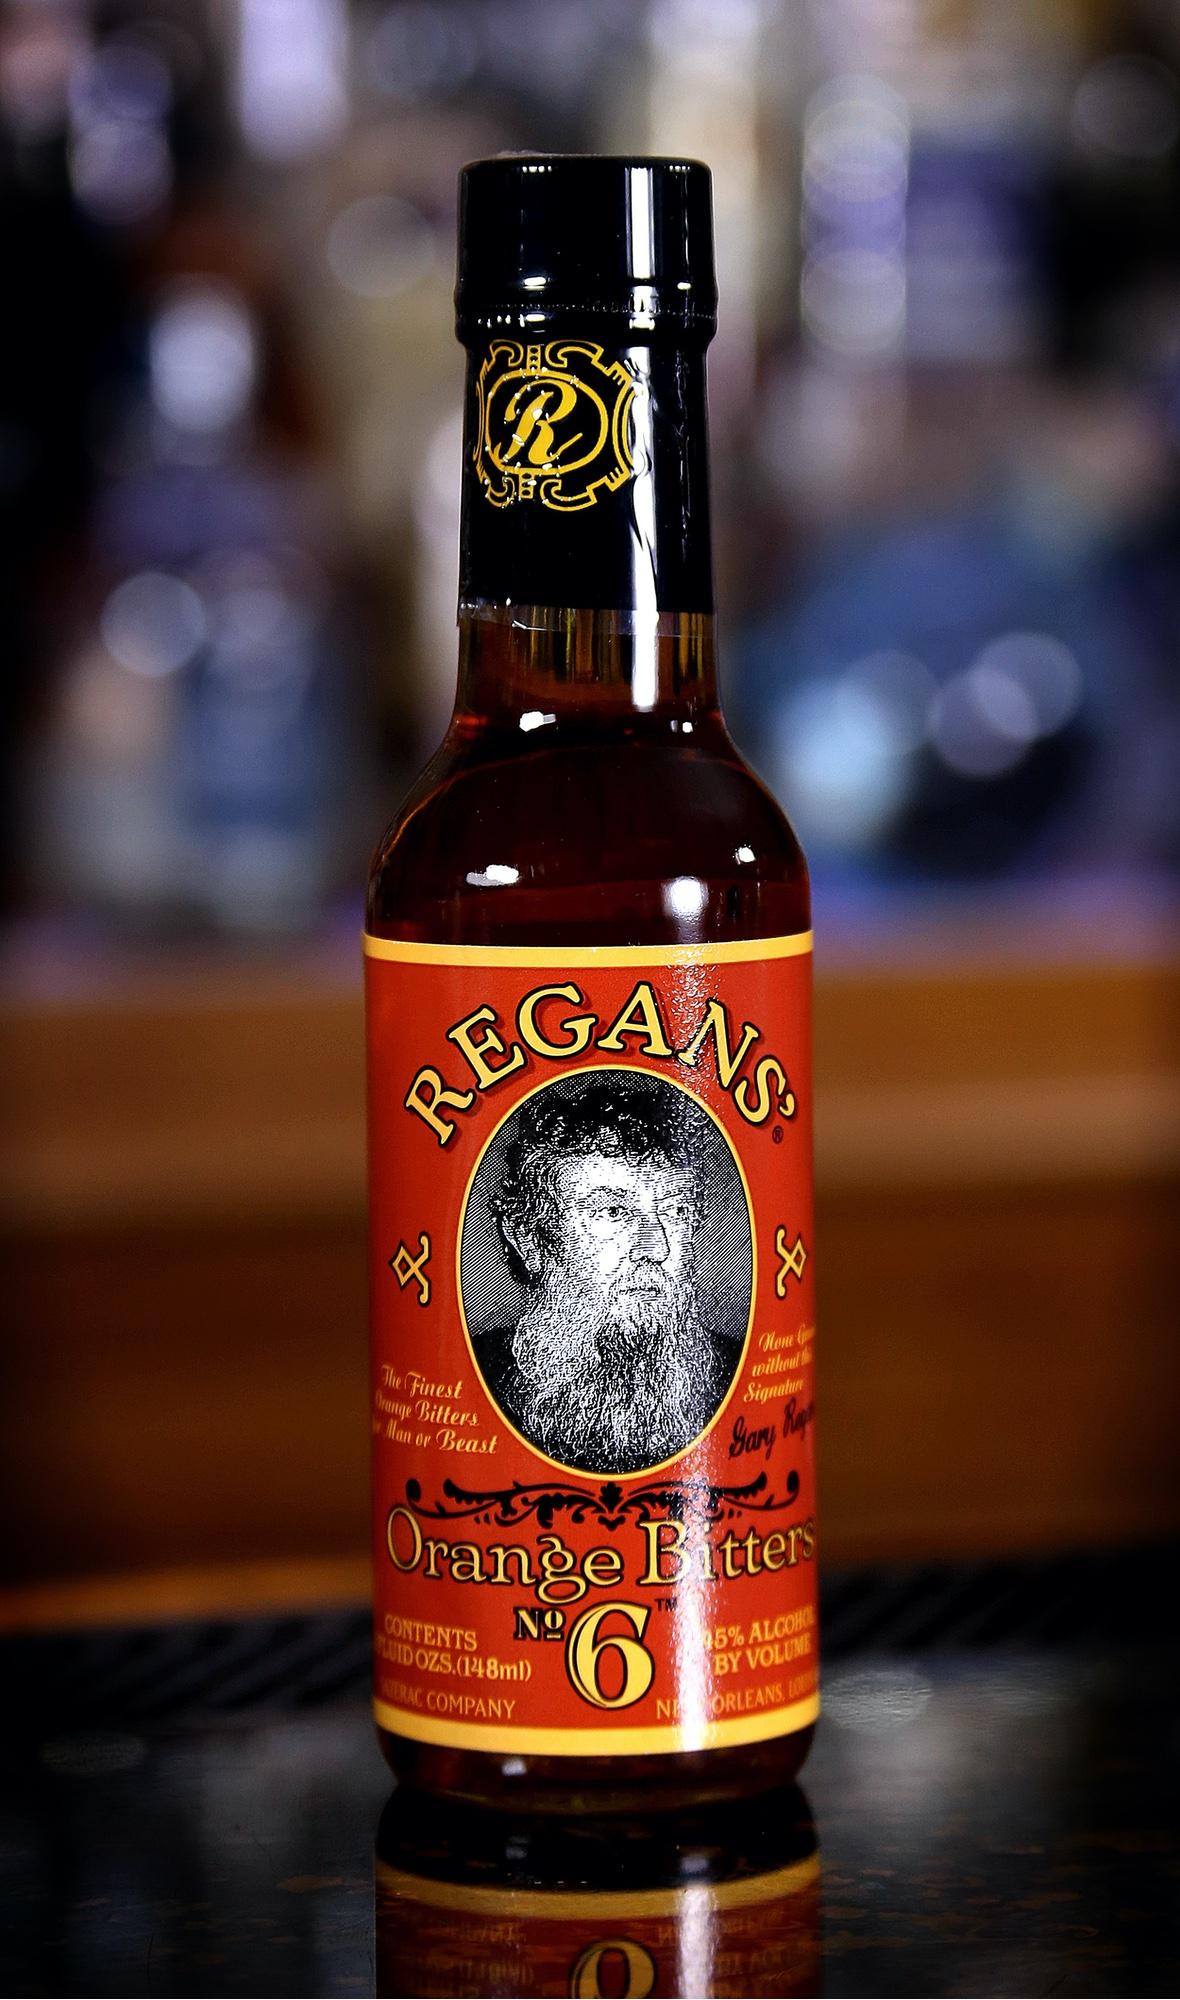 Regan's Orange Bitters #6